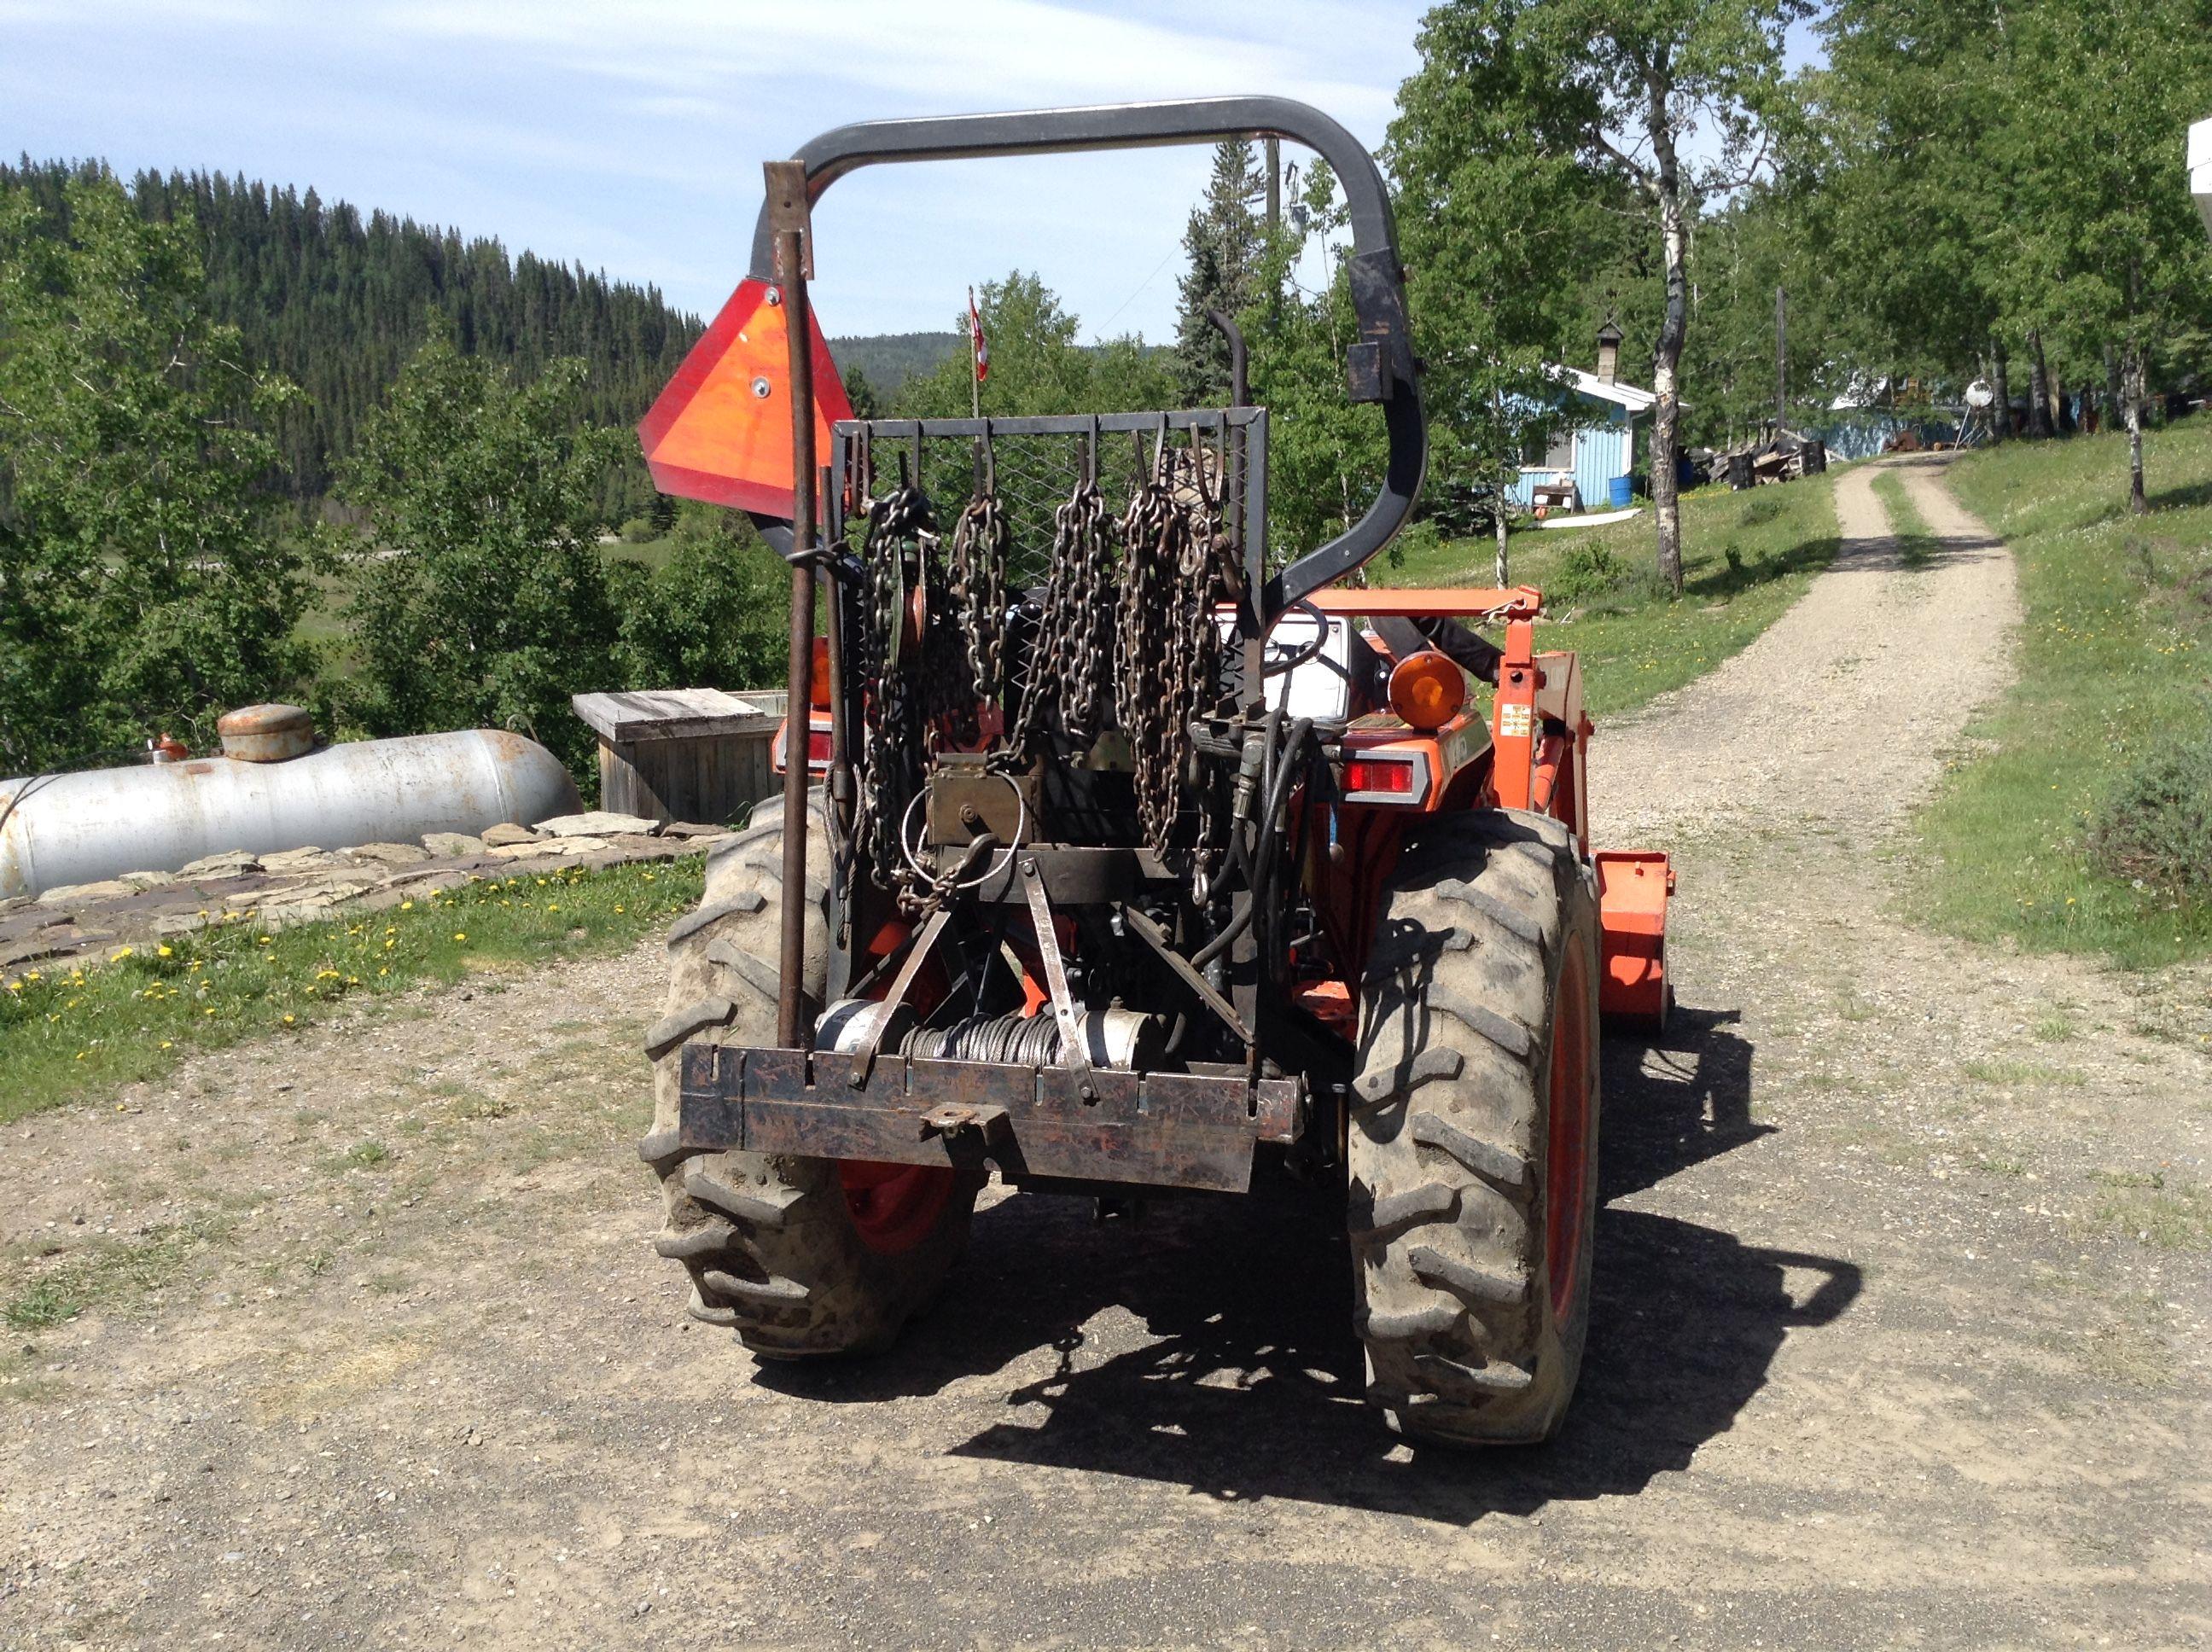 My 3 Point Hitch Hydraulic Logging Winch On L2500 Kubota Tractor